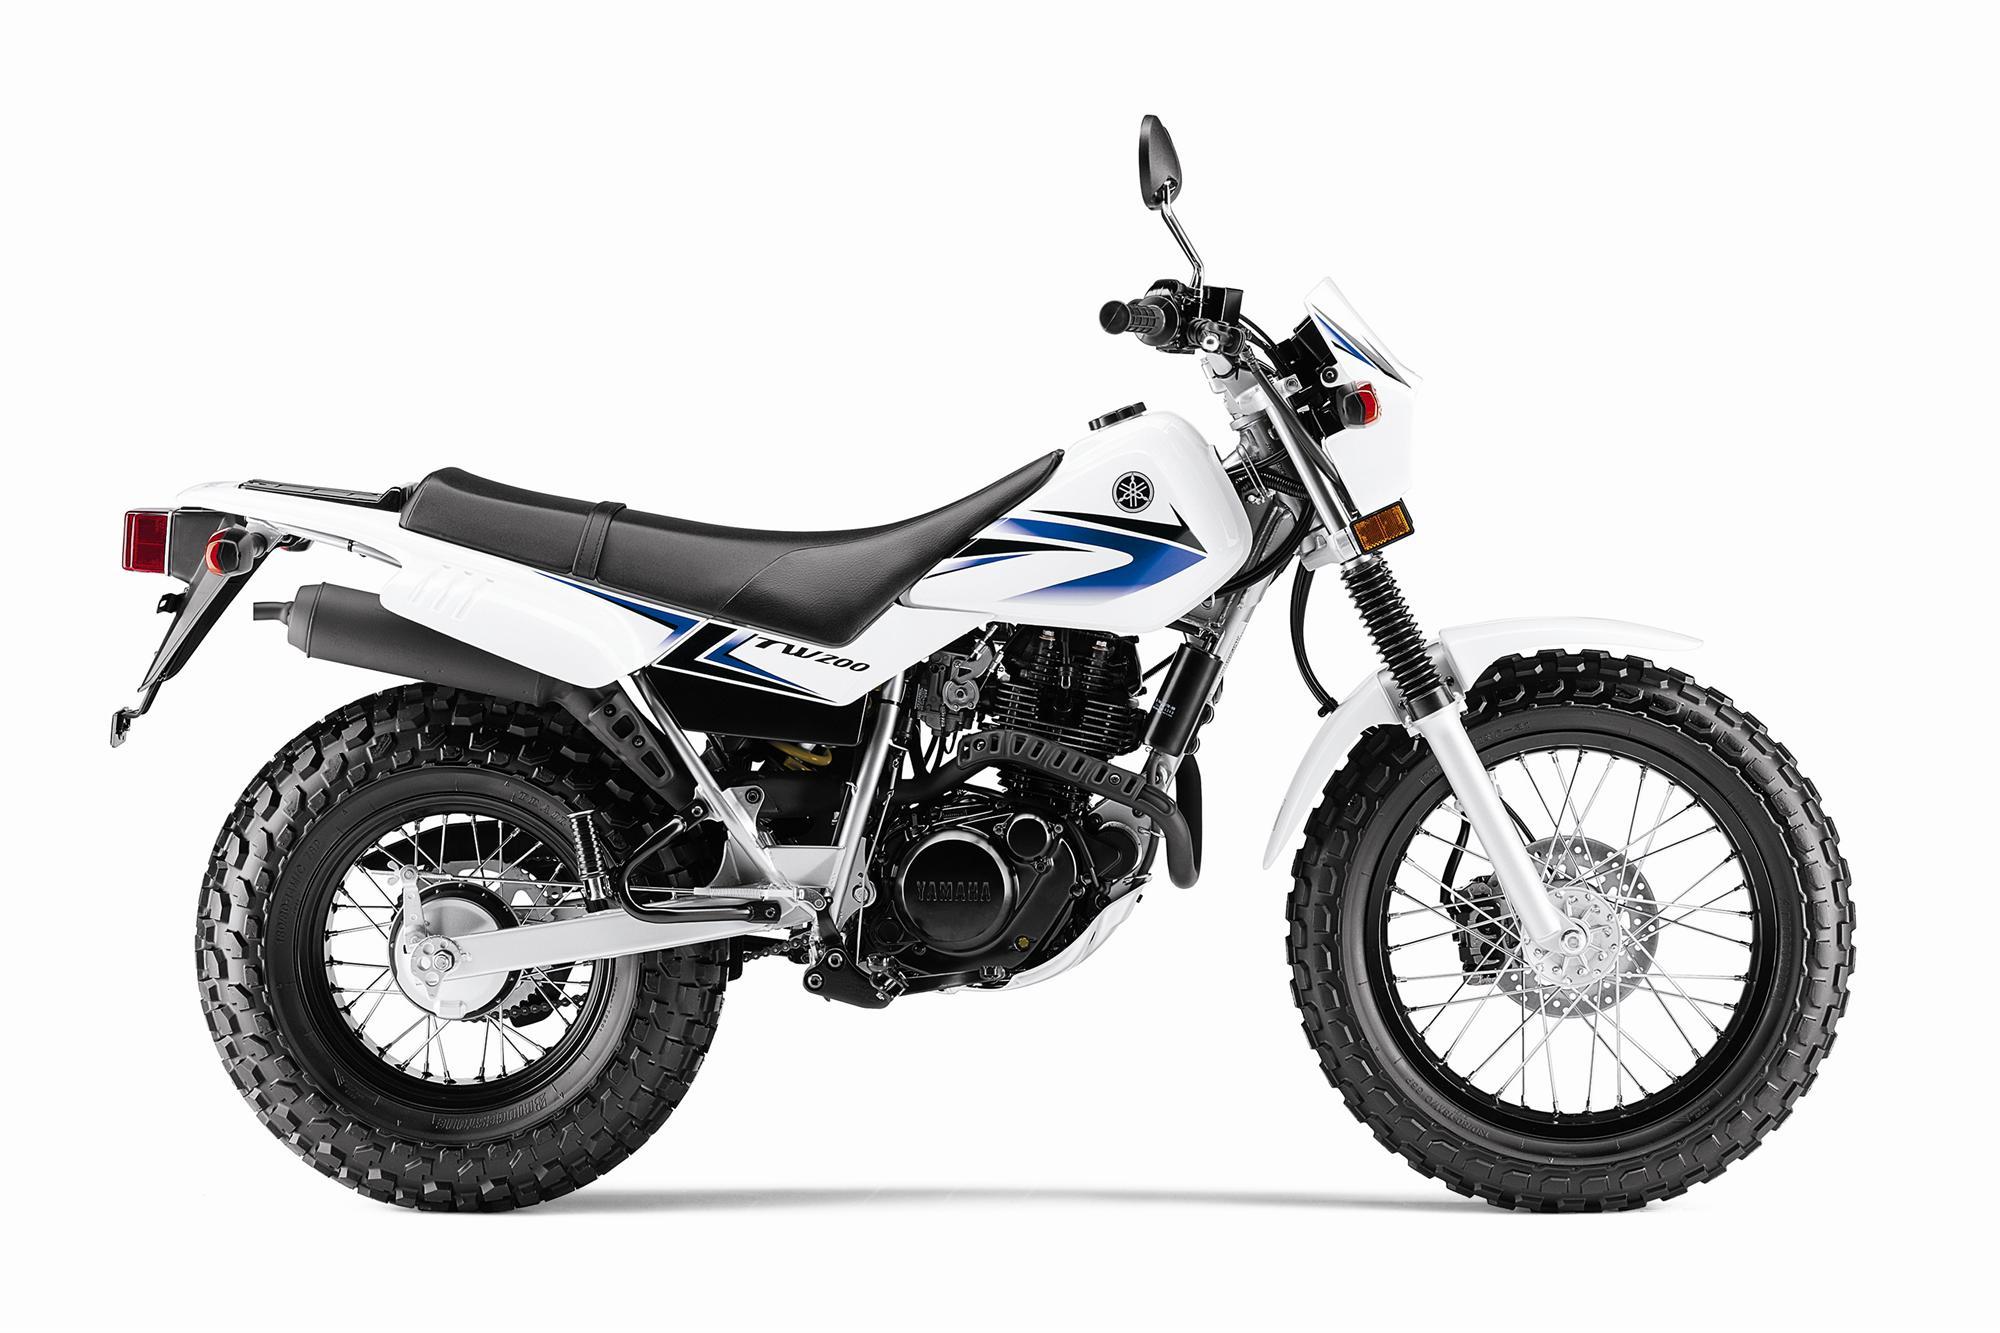 Yamaha Tw200 Specs